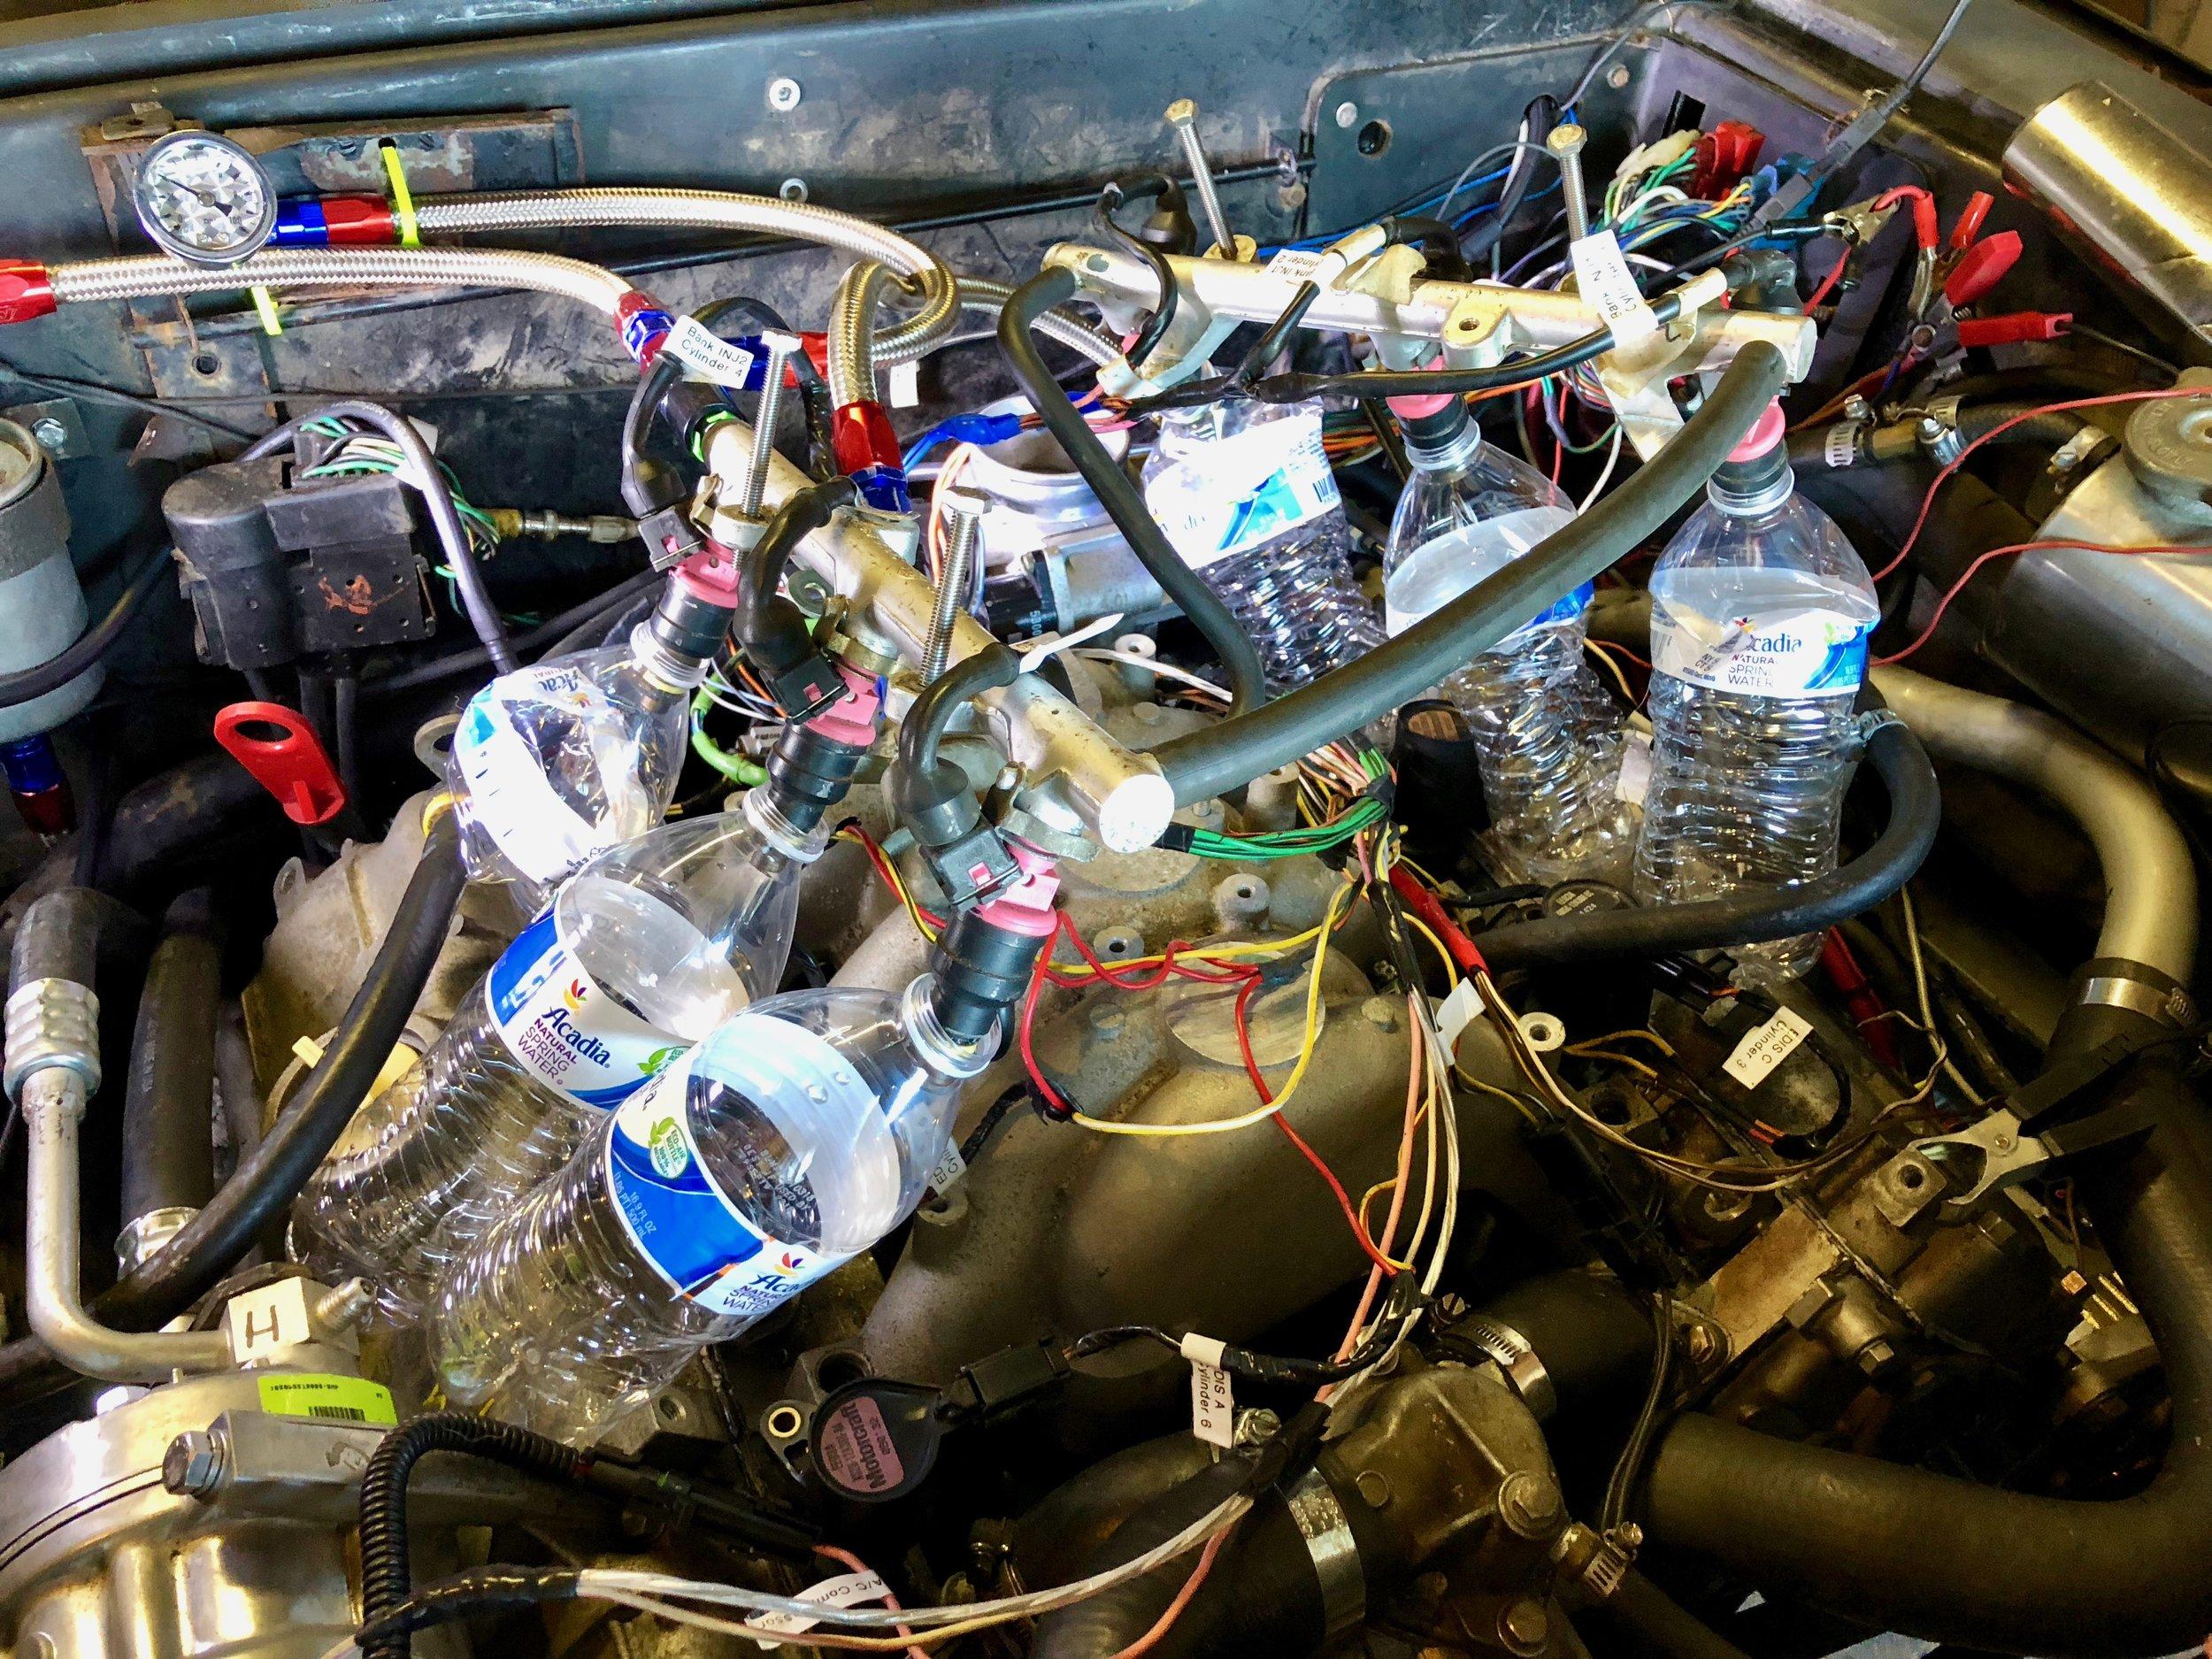 Injectors in water bottles for testing fuel flow.